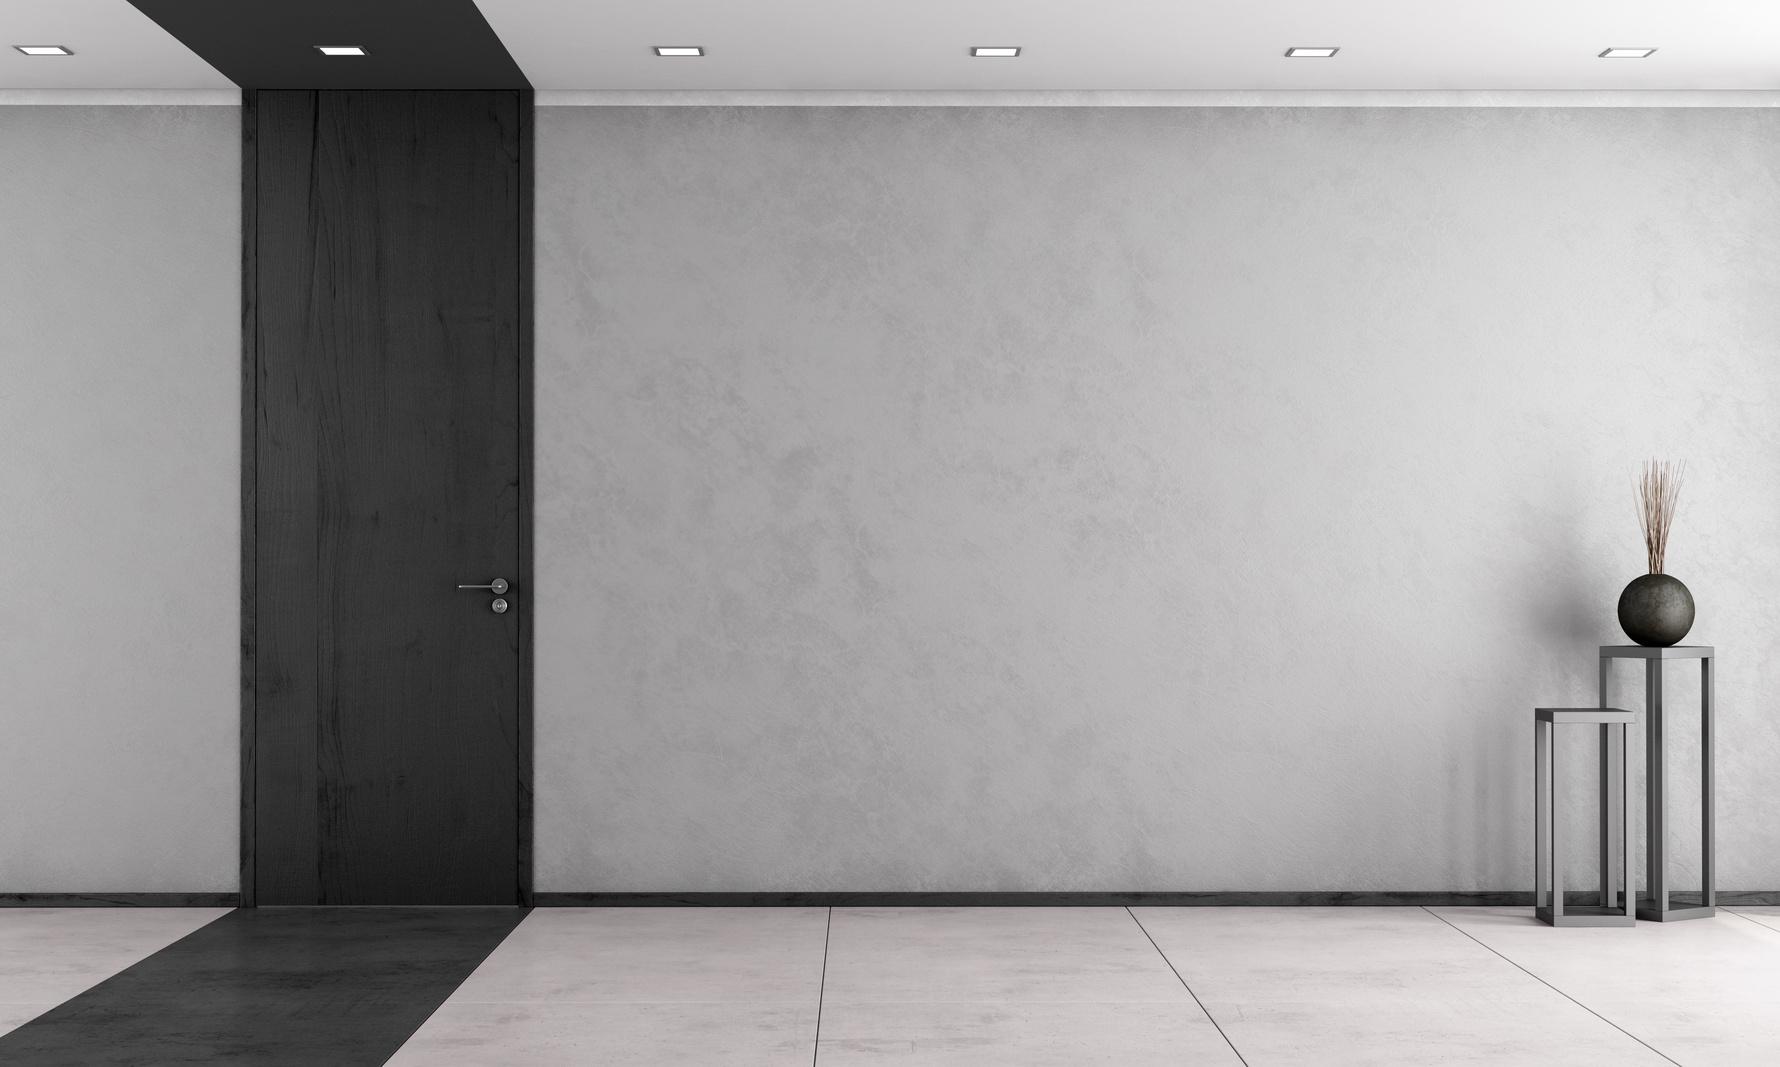 Minimalist living room with closed door